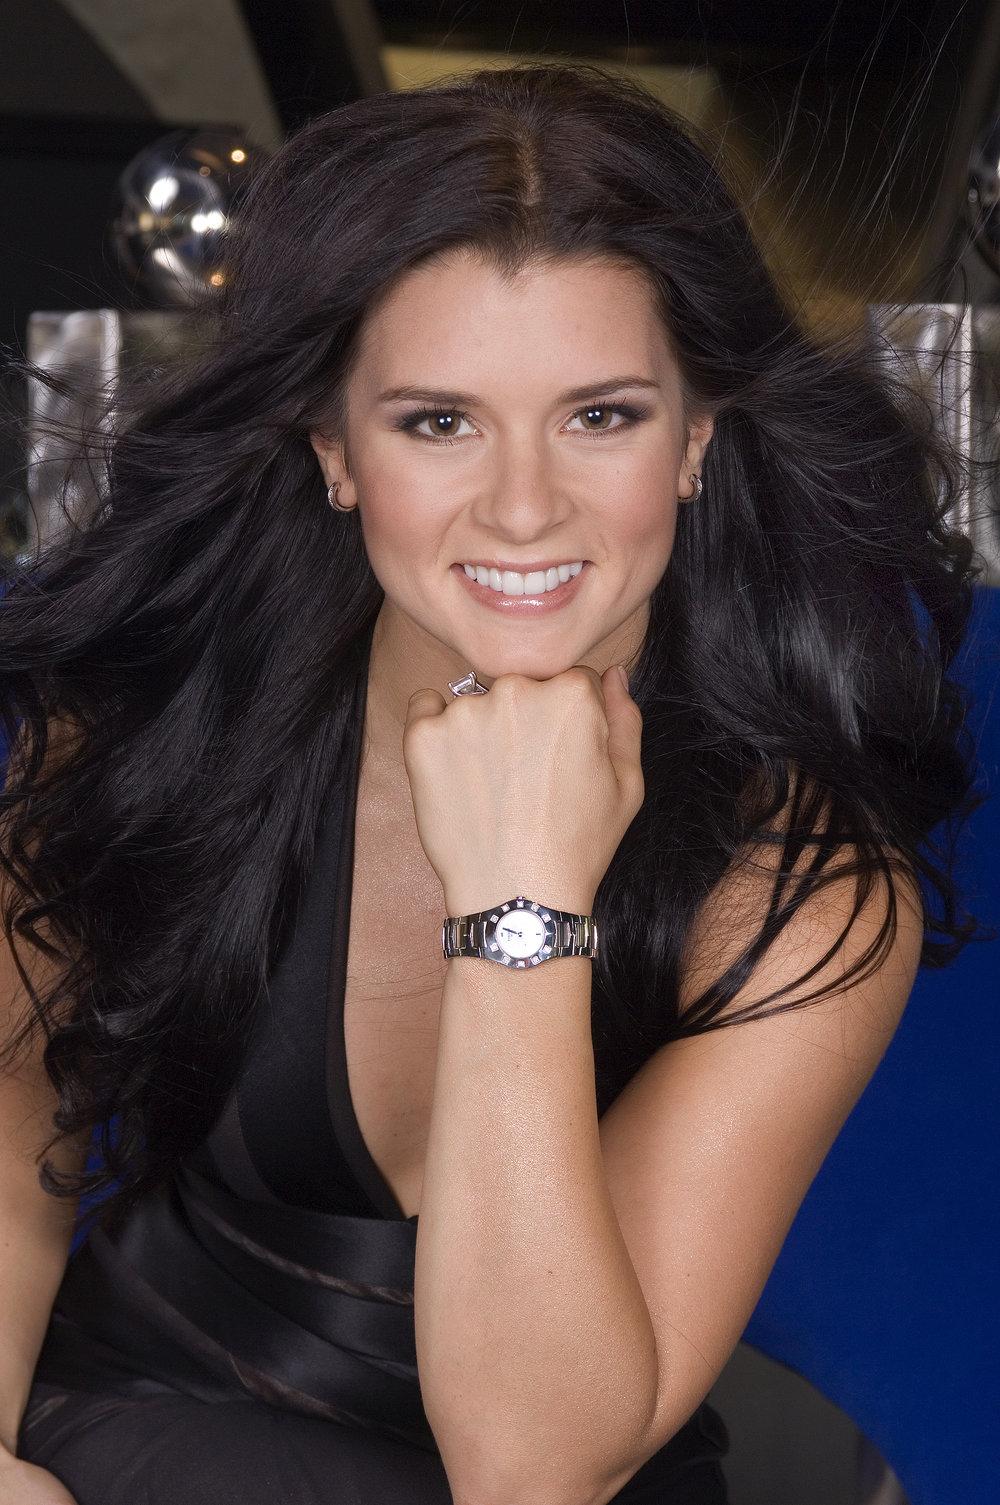 Danica Patrick - Indy/NASCAR Racer